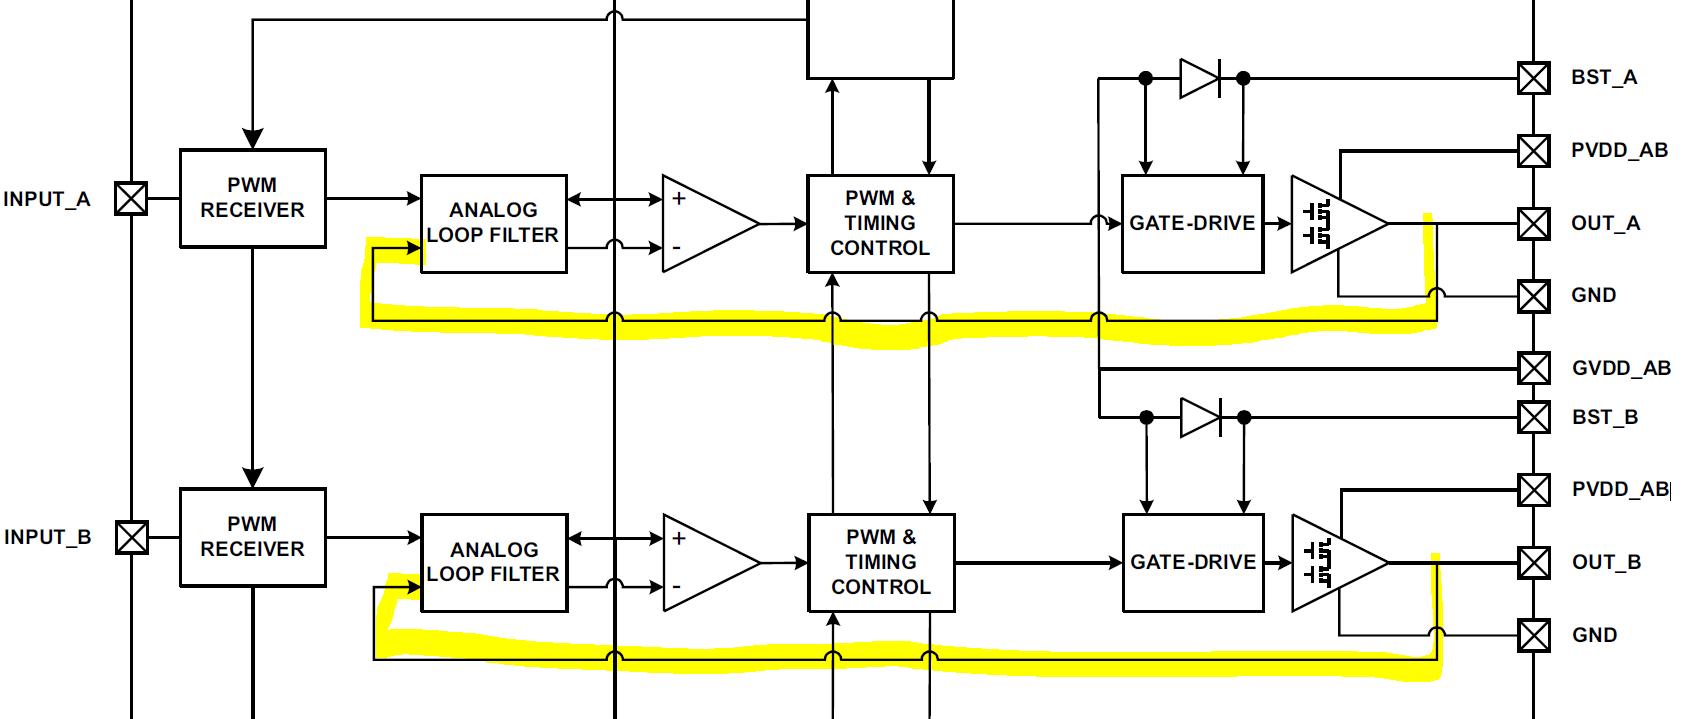 Class D Amp Berlegung Full Bridge Mit Tas5558 Pwm Ic Amplifier Circuit Preview Image For Prozessing